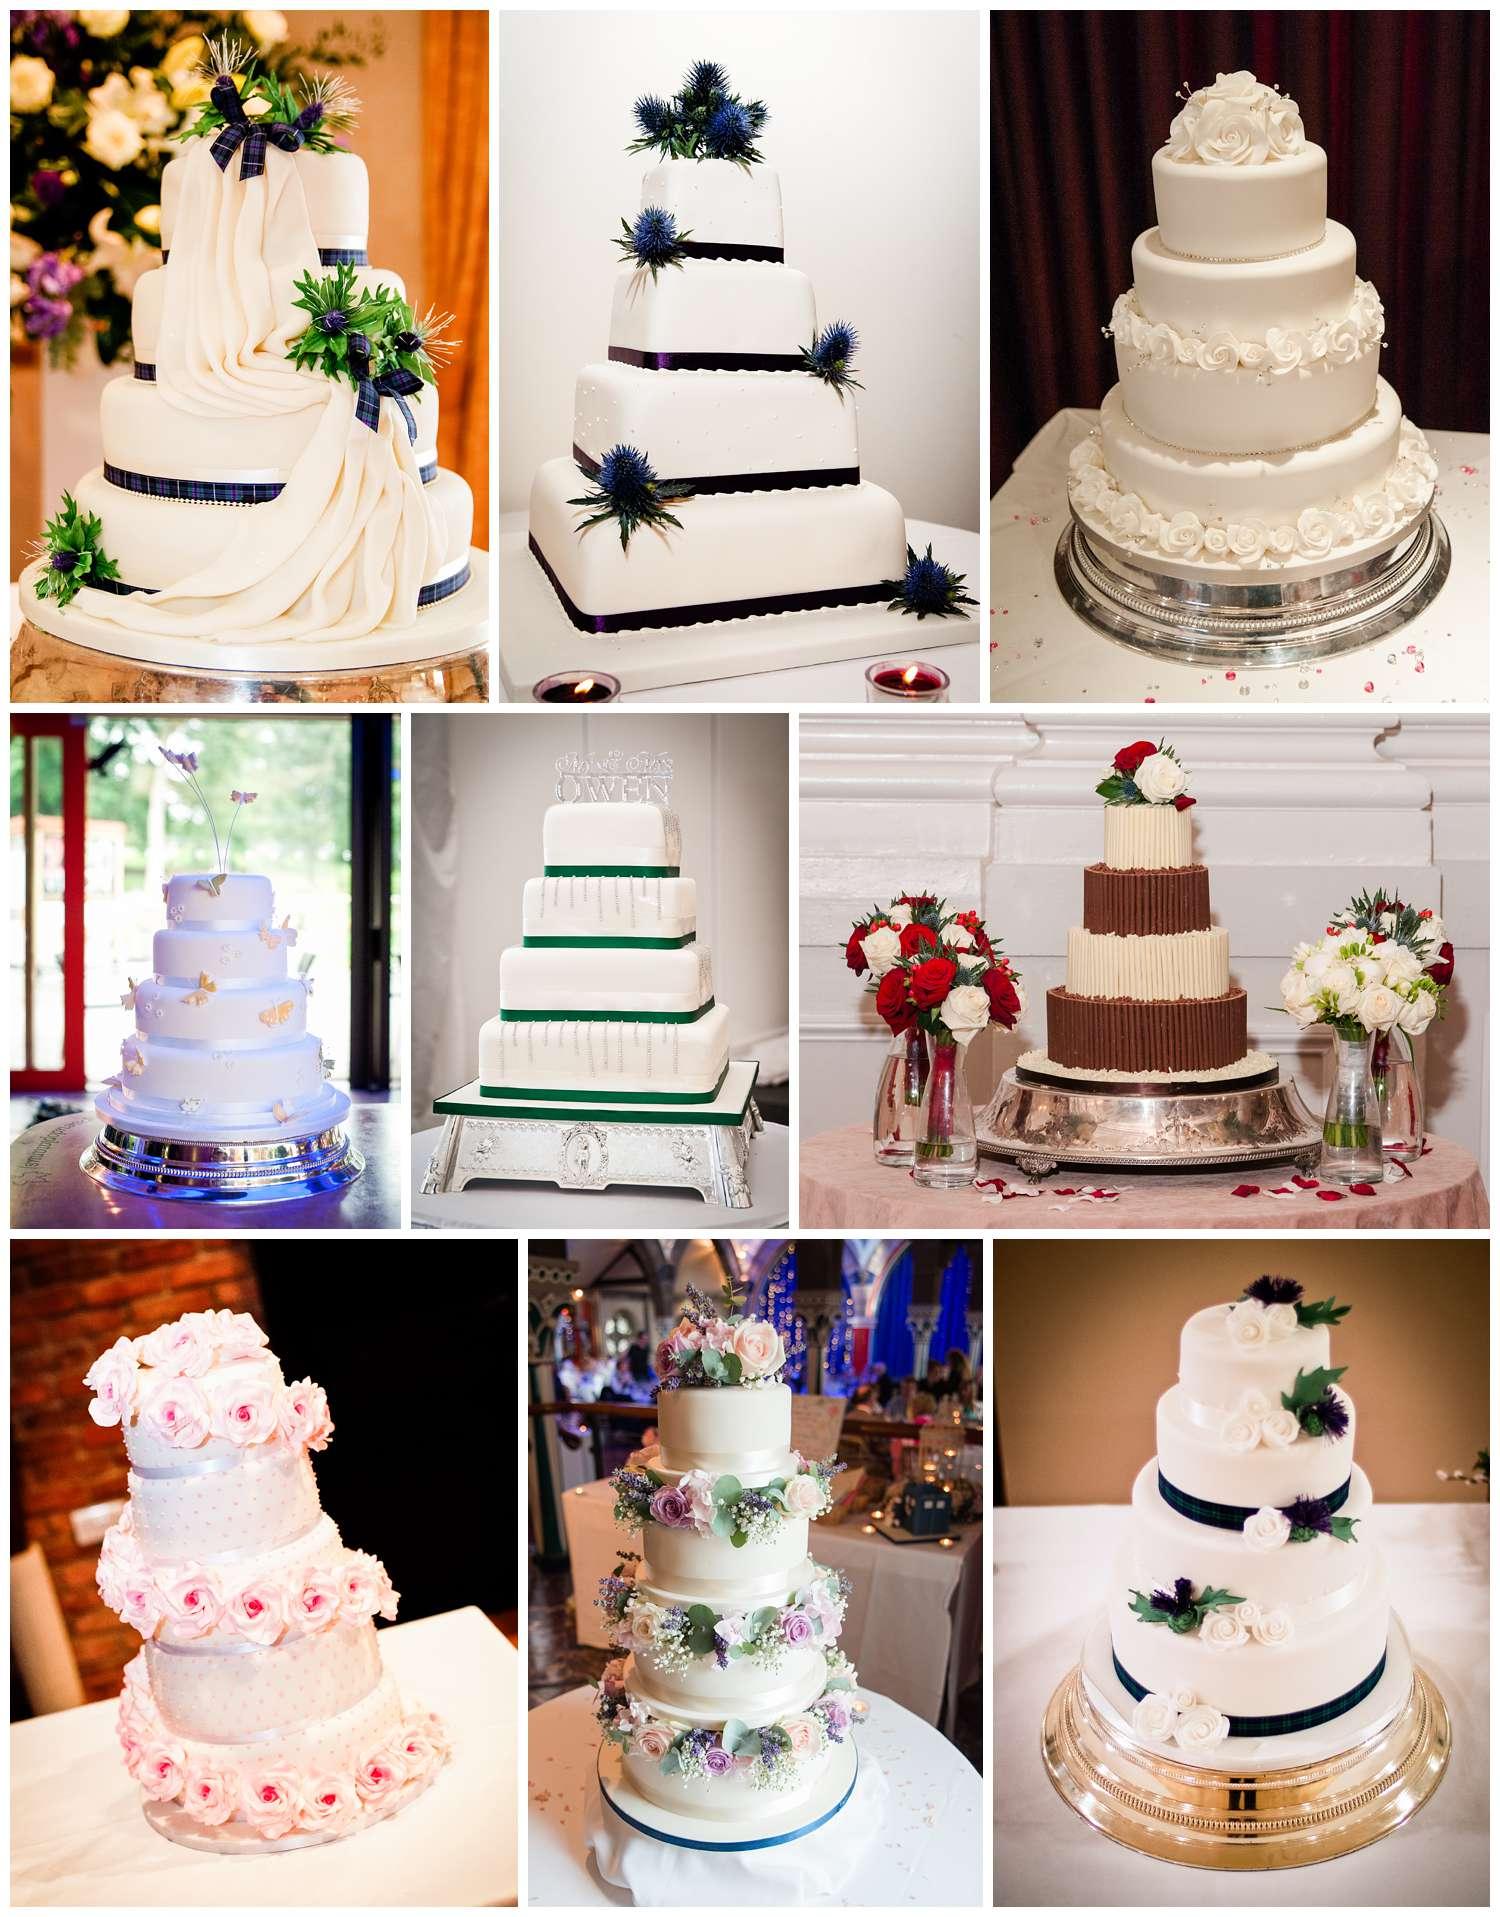 Four-tier wedding cake ideas, ideas for your wedding cake